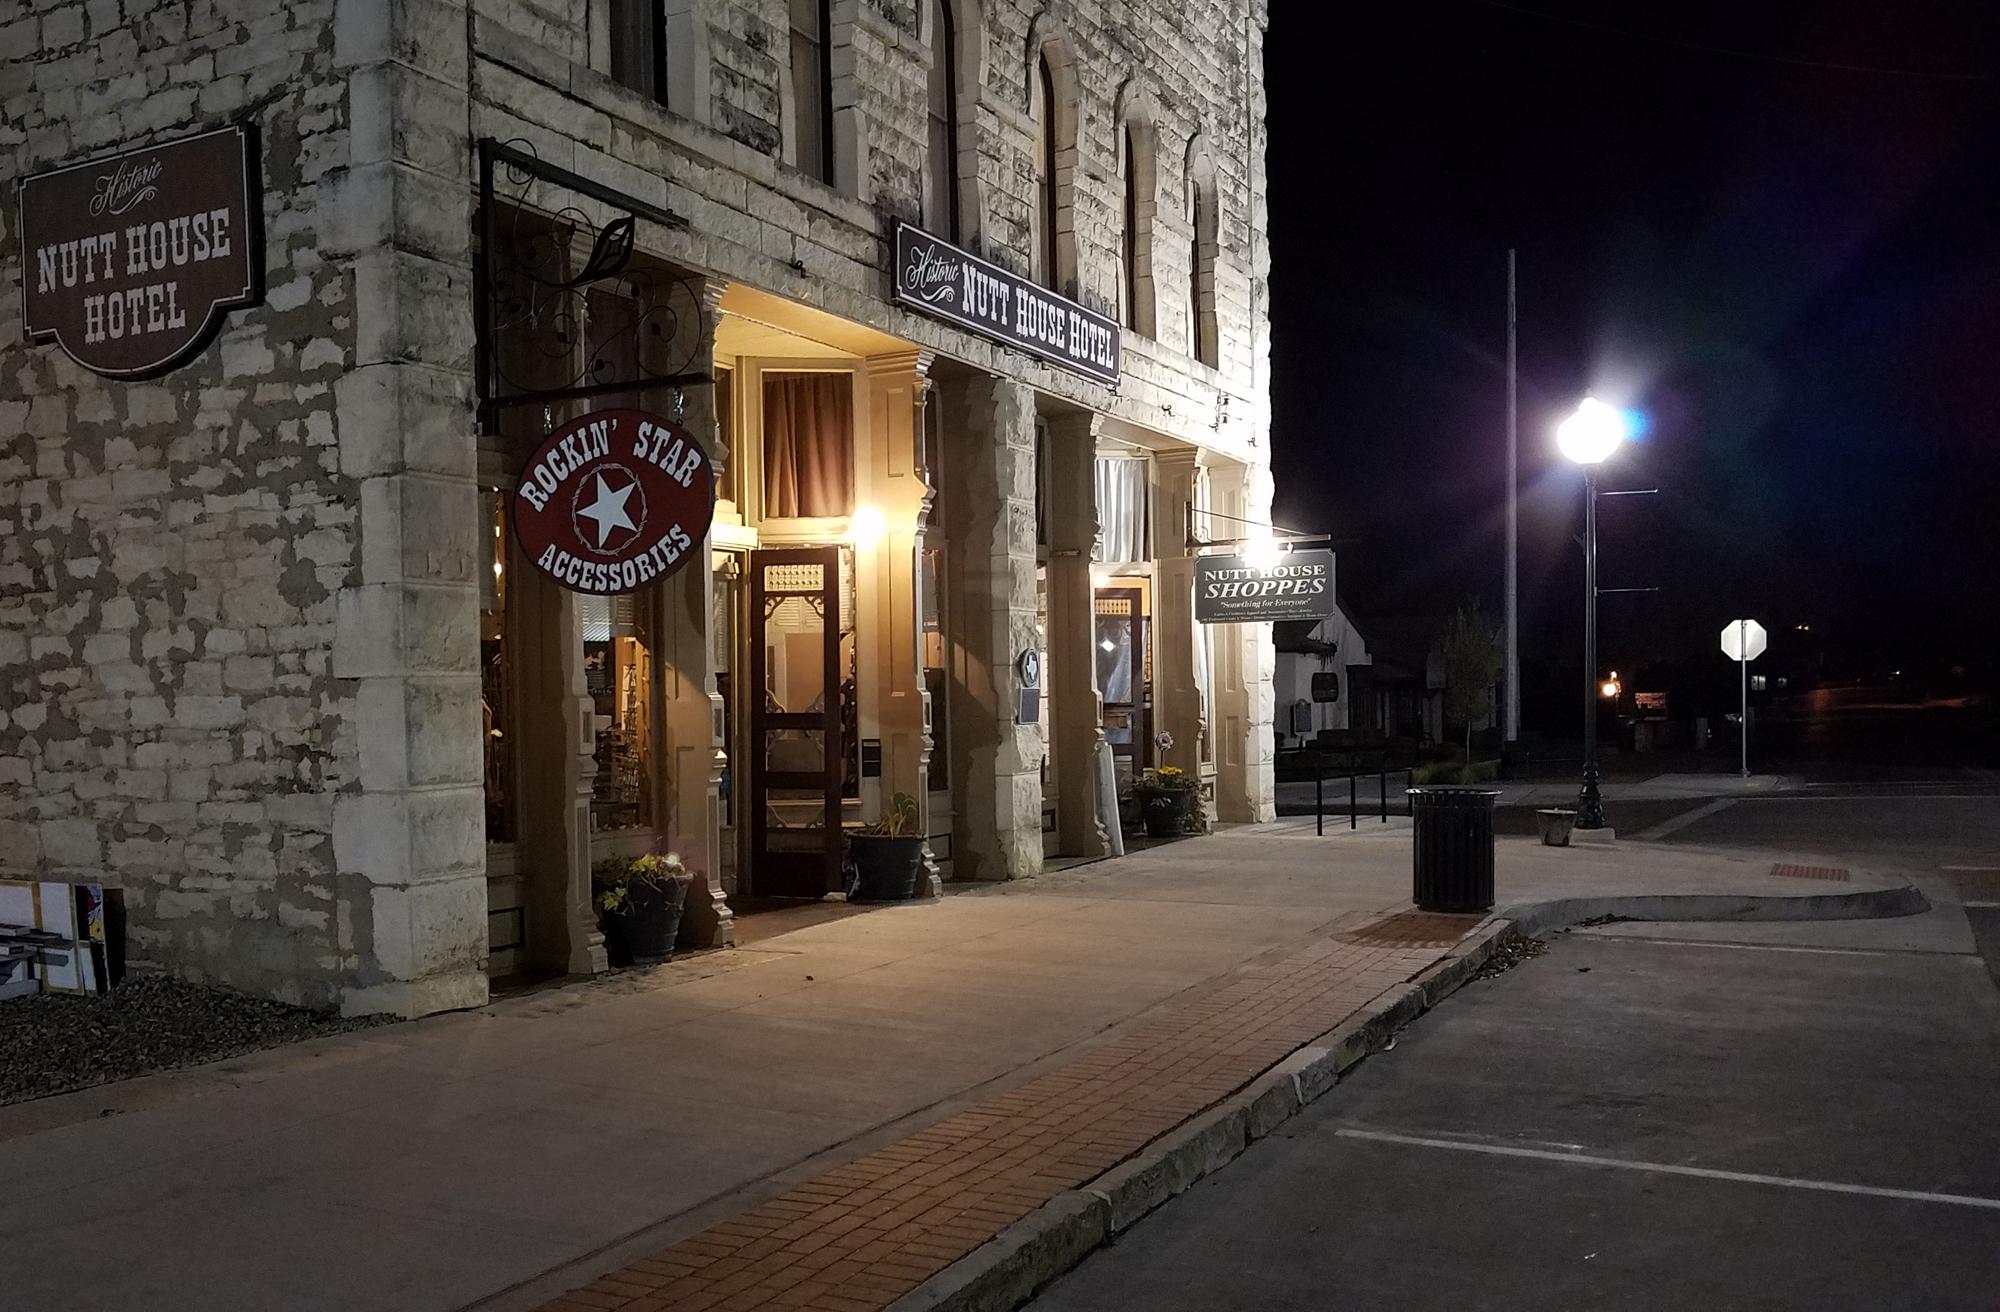 Historic Granbury Texas, Downtown Granbury Texas, Texas Retirement Towns, Lake Towns Texas, Antique Shopping Texas, Granbury Square